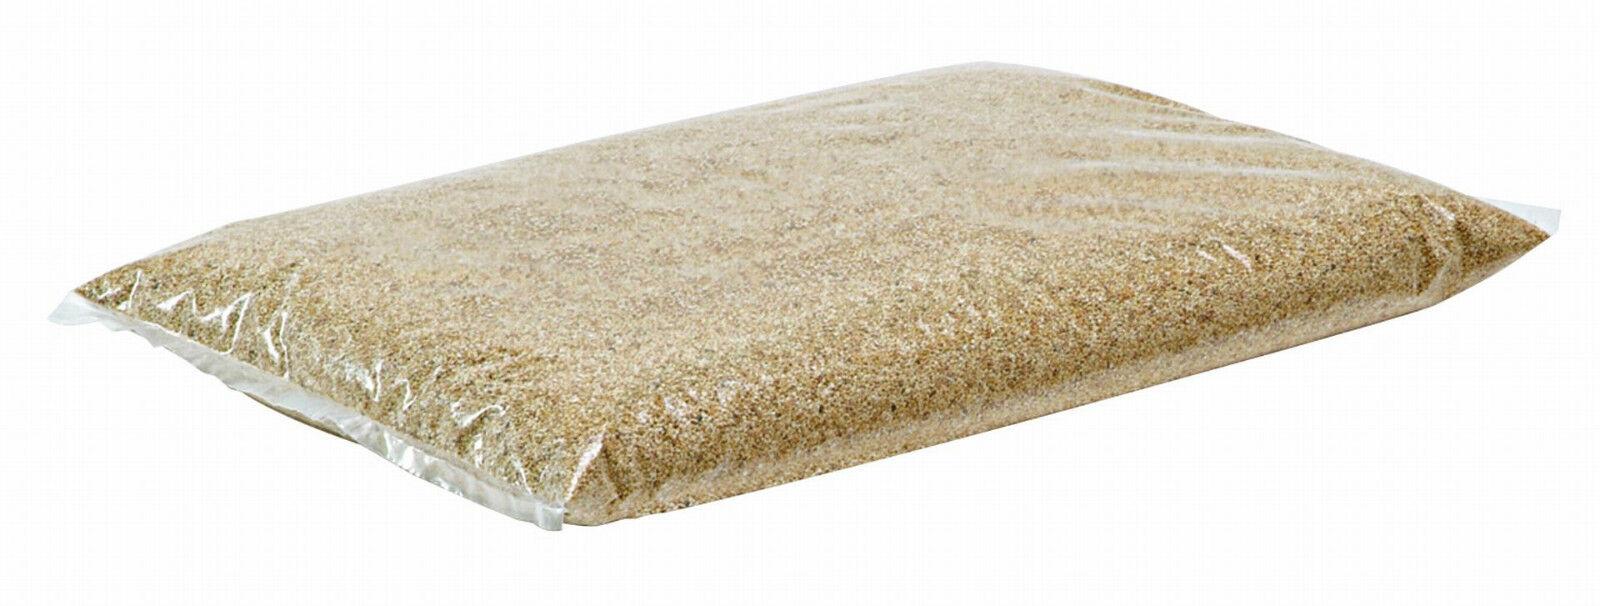 Polidry Poliergranulat 3 5 Kg Mais Granulat Sterilisiert Besteck Polieren Ebay